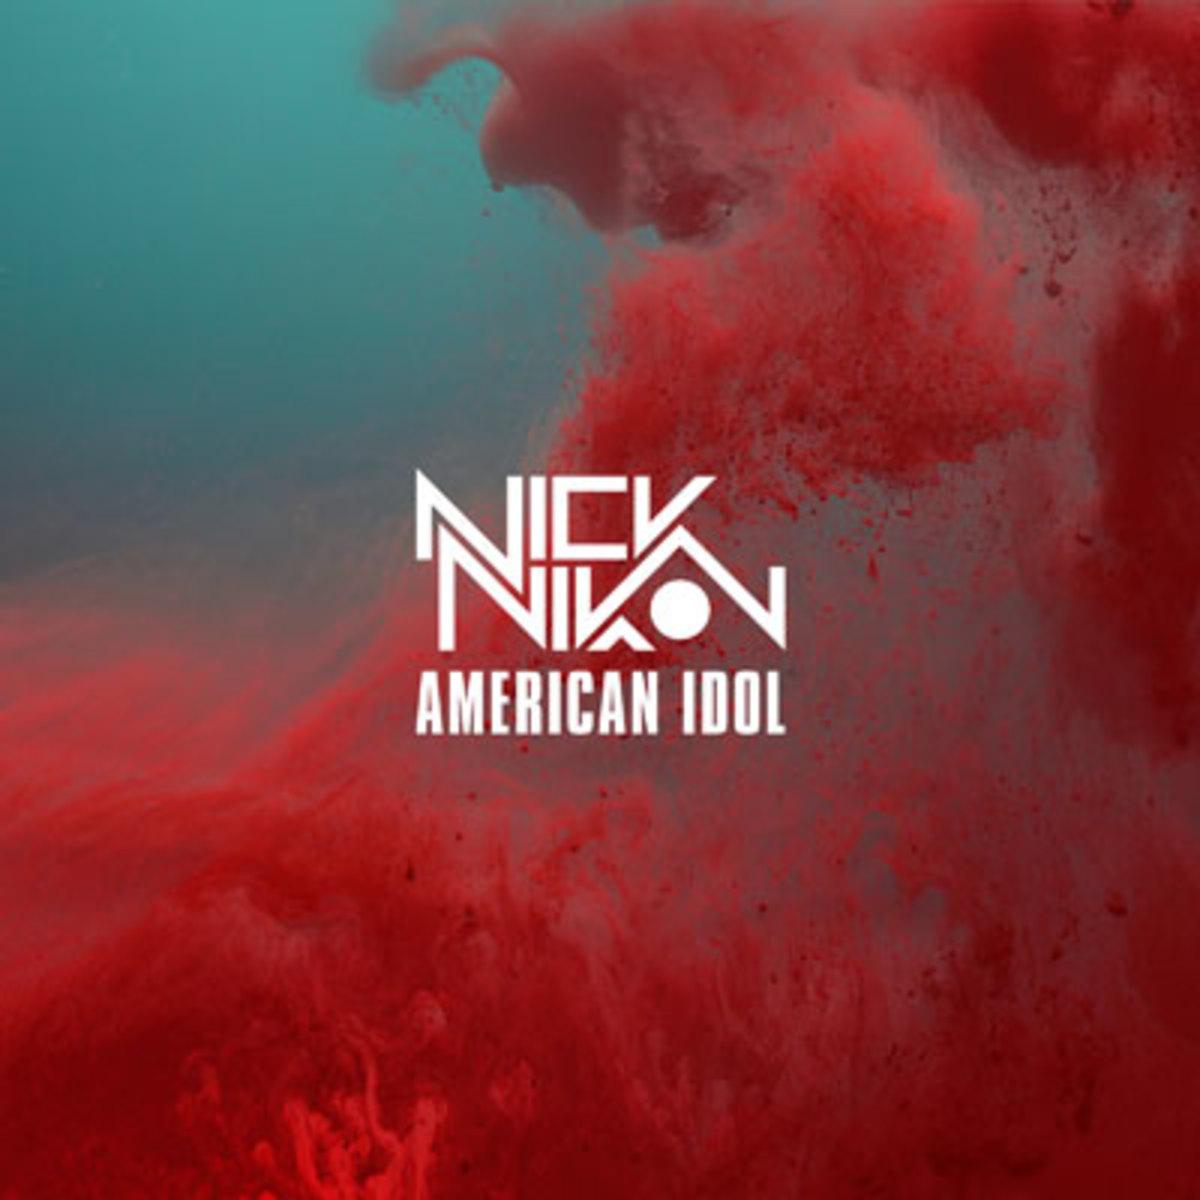 nick-nikon-american-idol.jpg